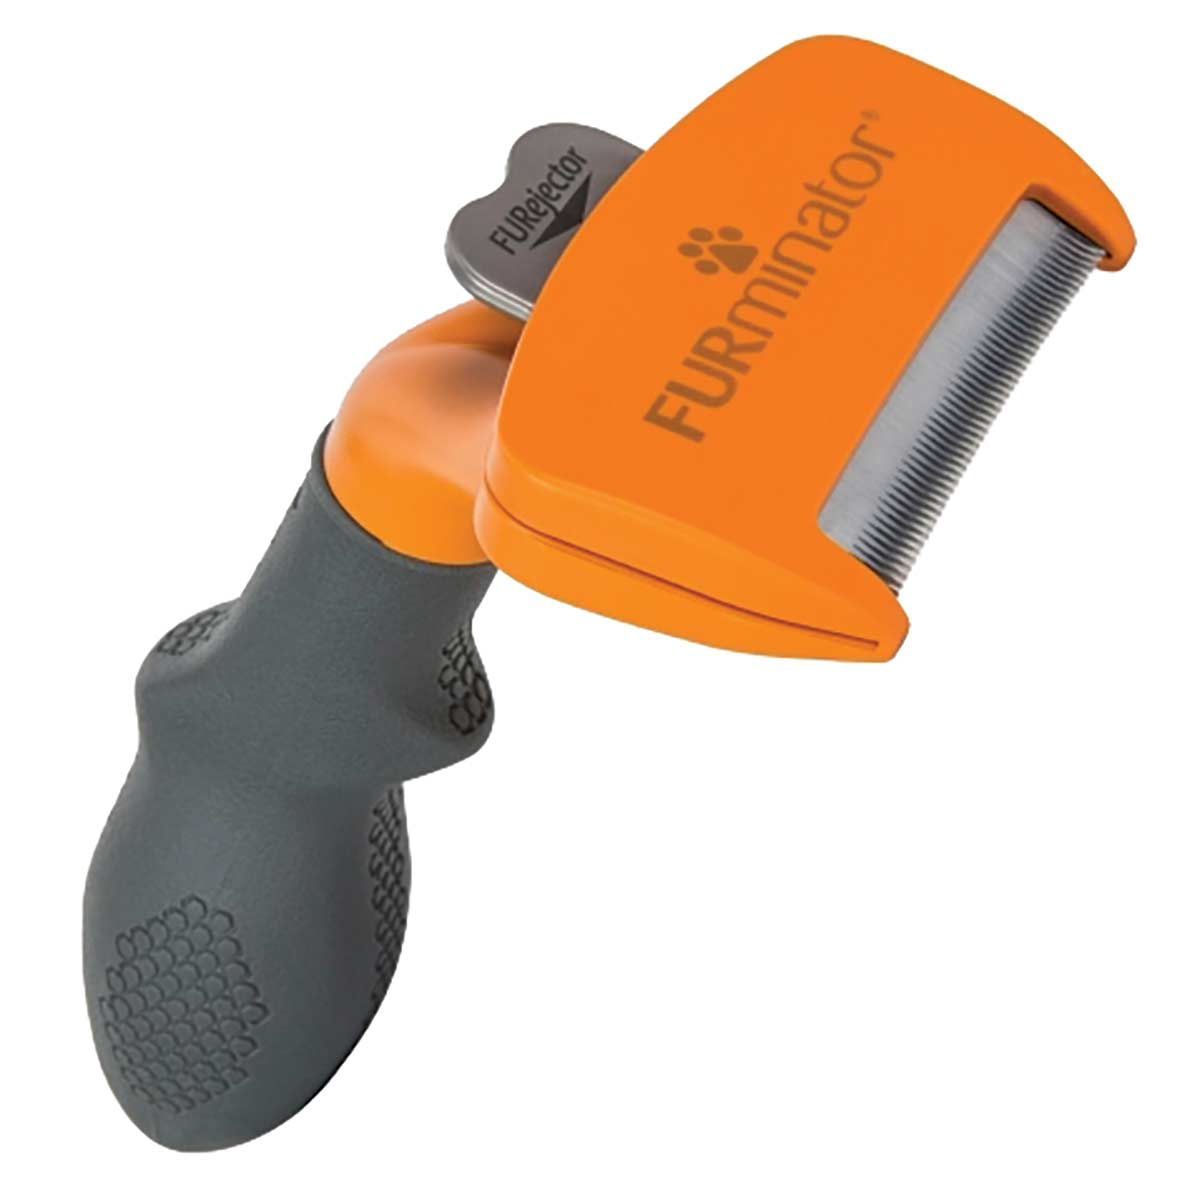 Furminator Medium Dog deShedding Tool - Short Hair available at Ryan's Pet Supplies